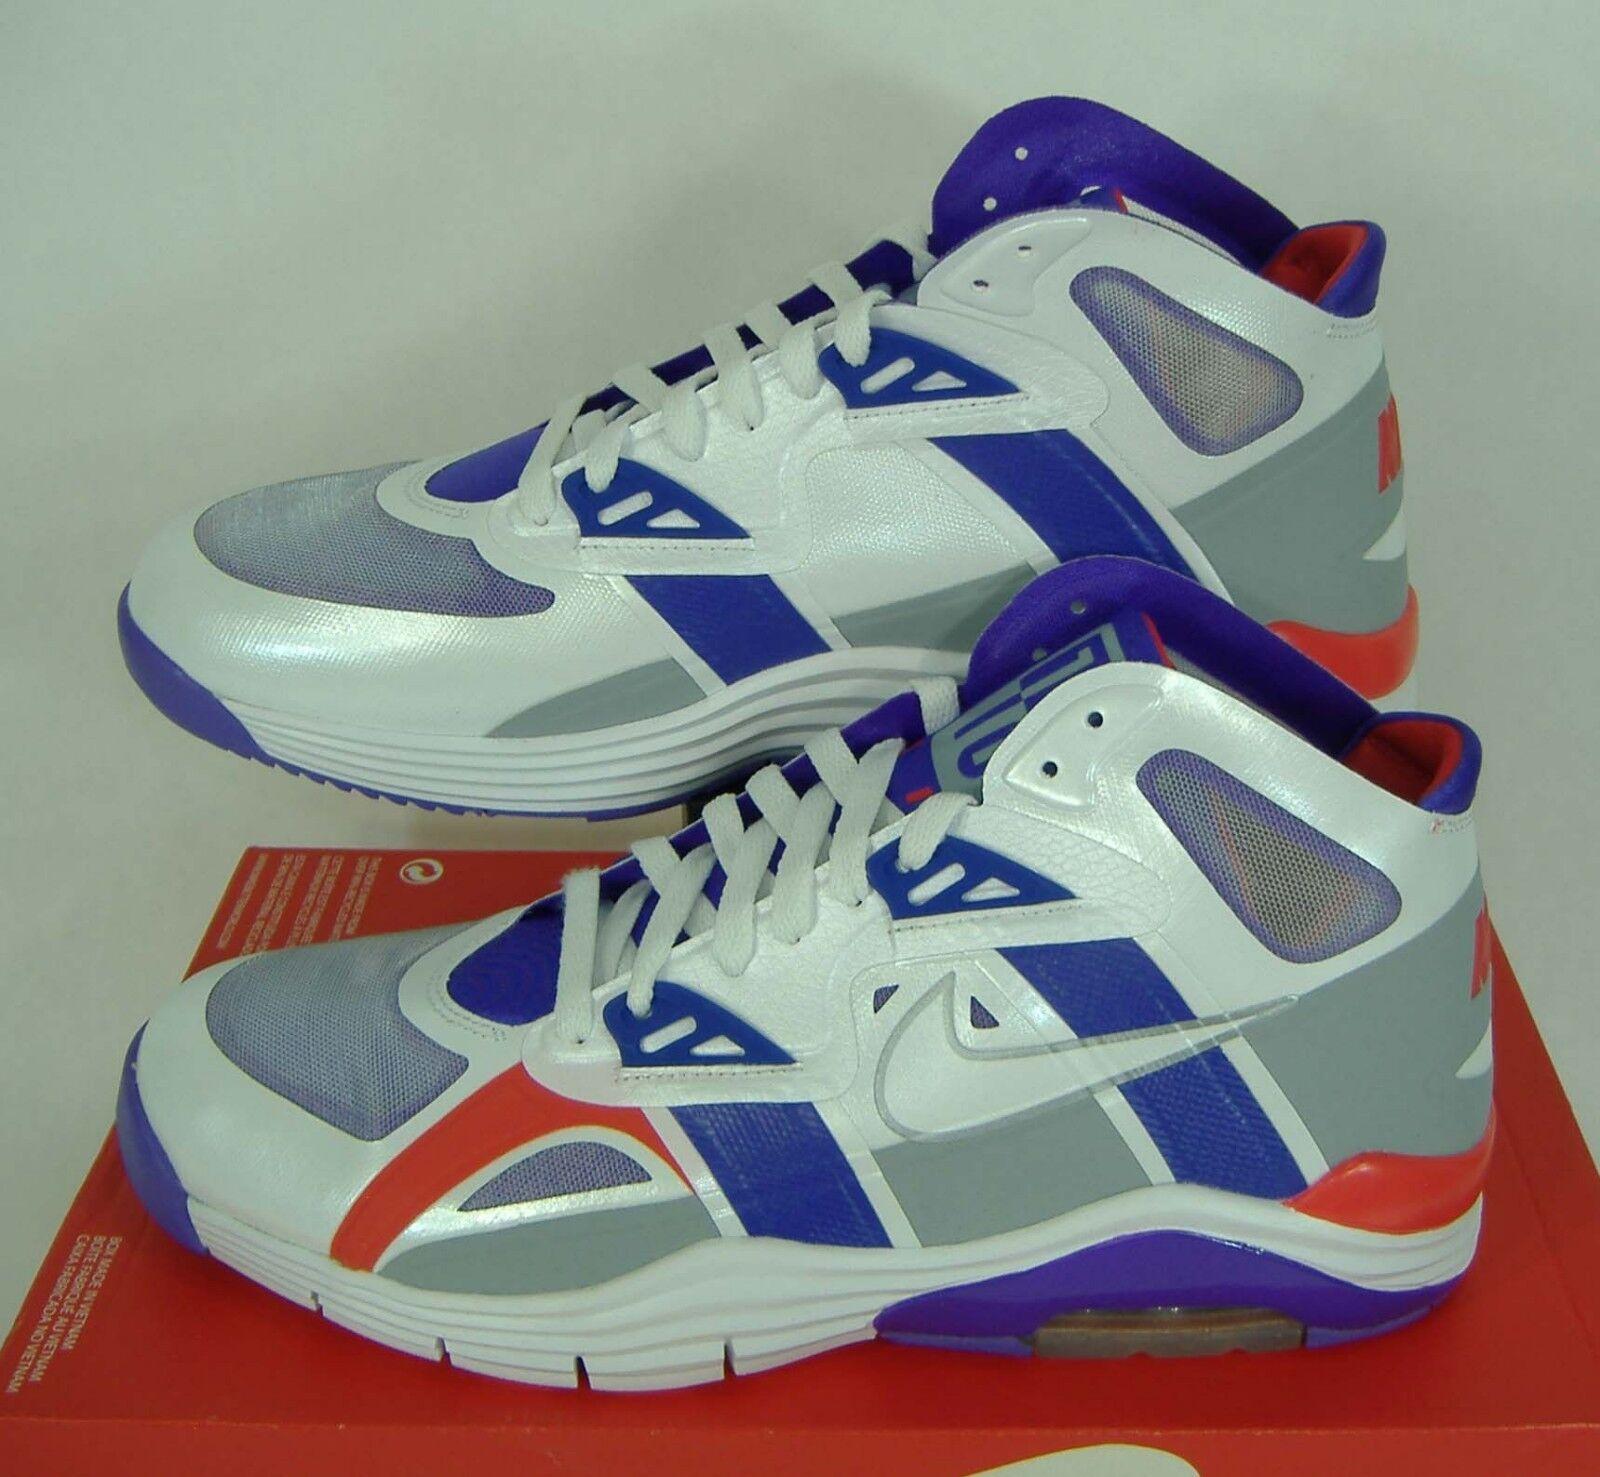 Nuevo hombre 13 Nike Lunar 180 Trainer Trainer Trainer Sc Zapatos de baloncesto 130 630922 -100 609d22